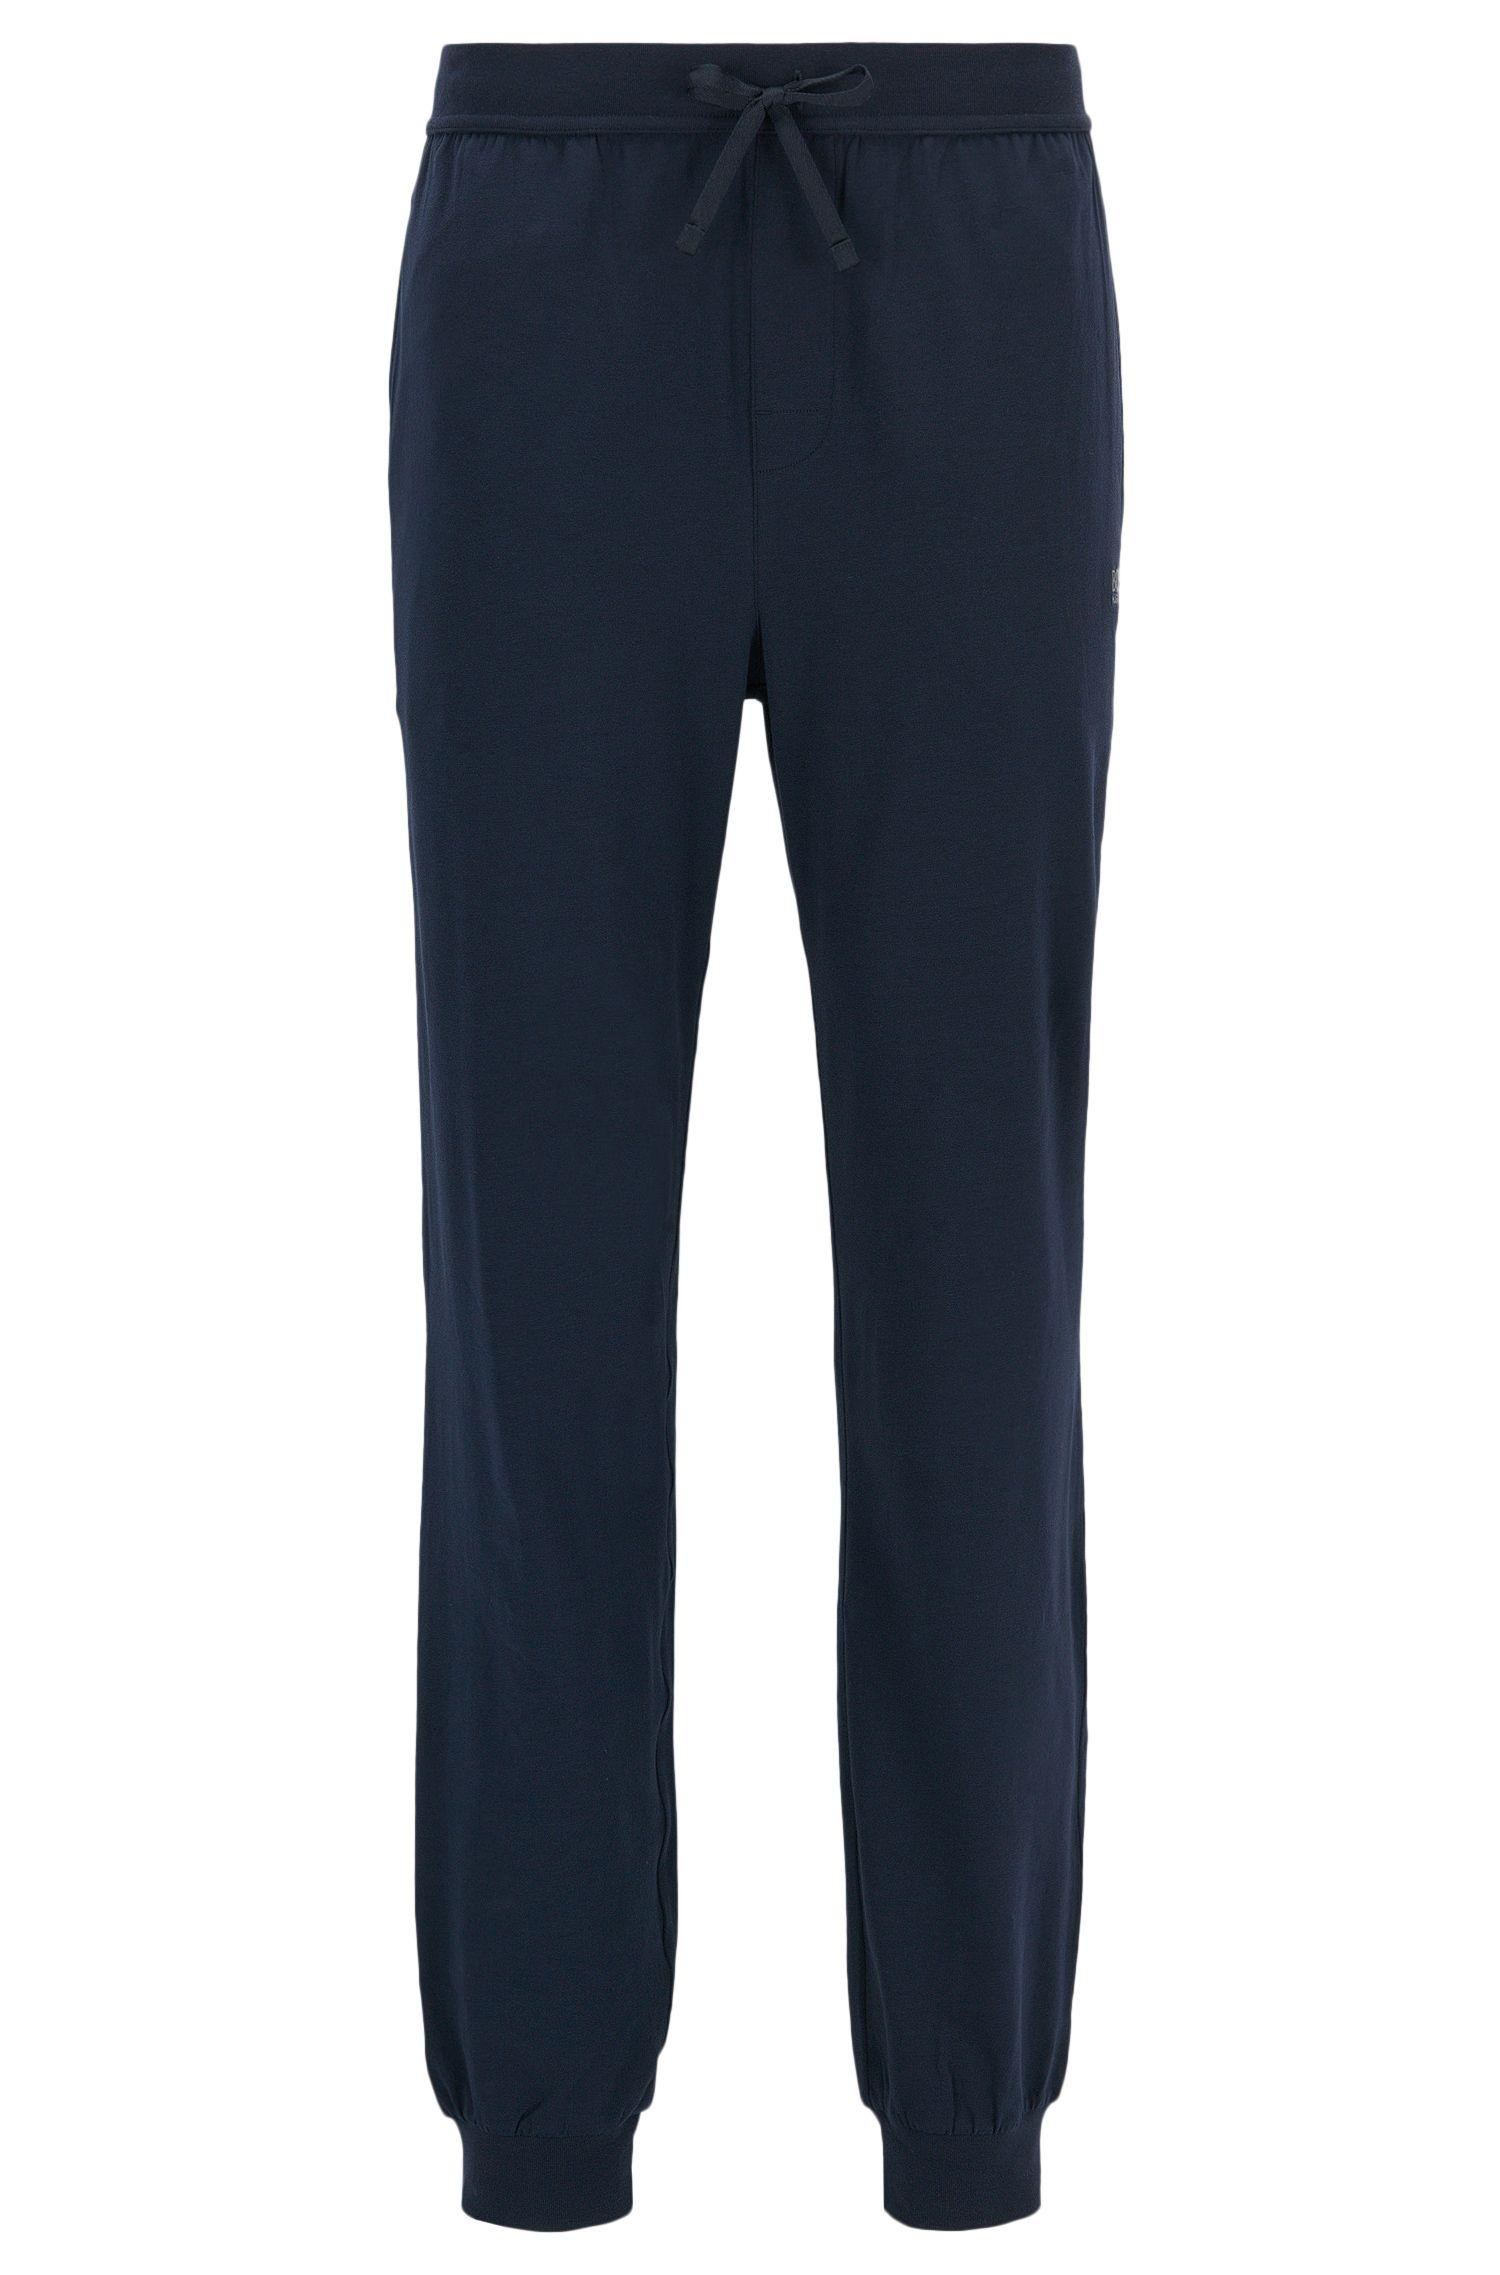 Cuffed loungewear bottoms in stretch cotton